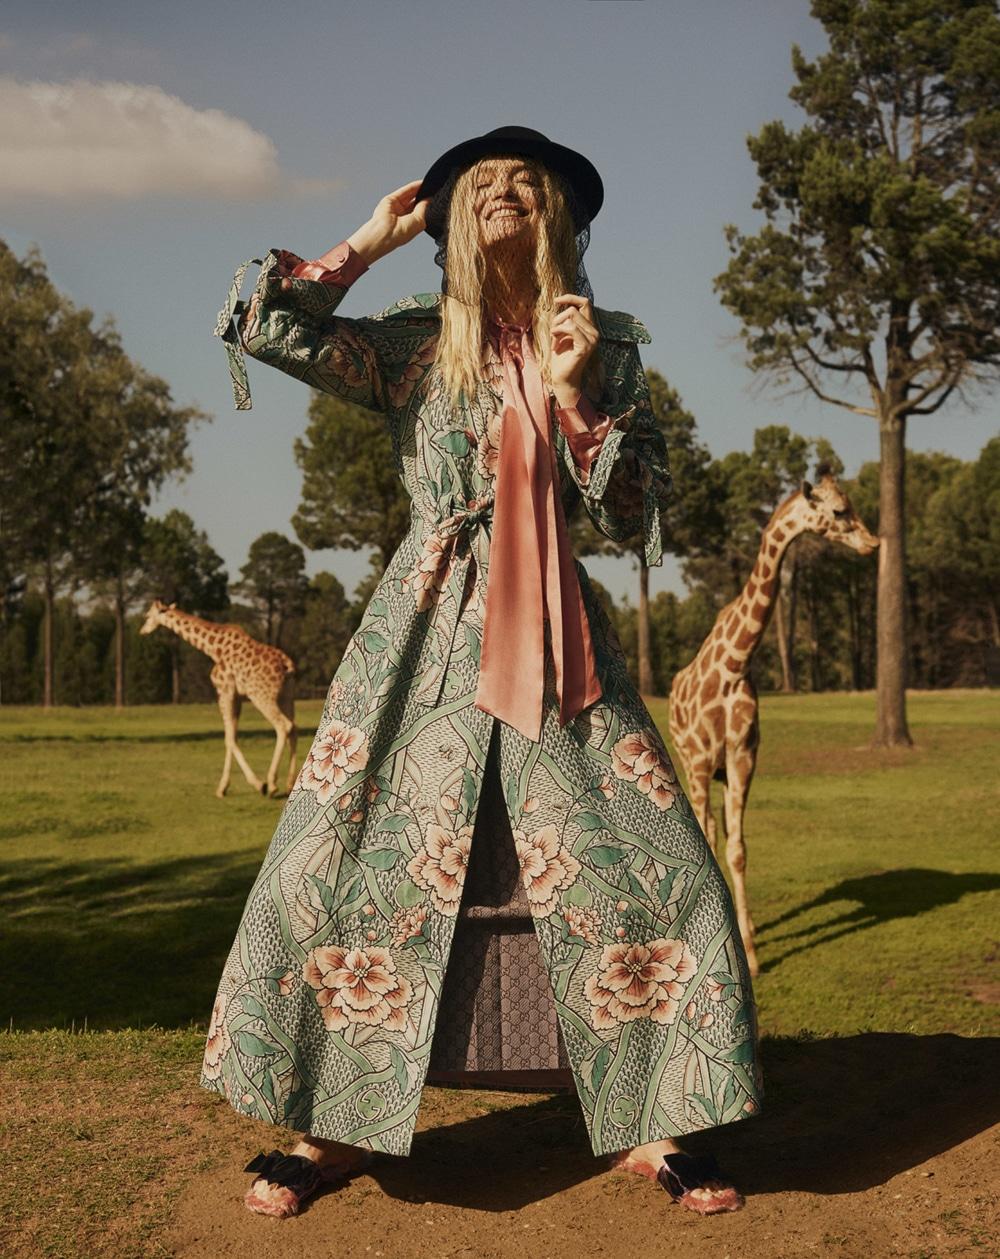 Georges-Antoni-Harpers-Bazaar-Australia-Gemma-Ward-2.jpg